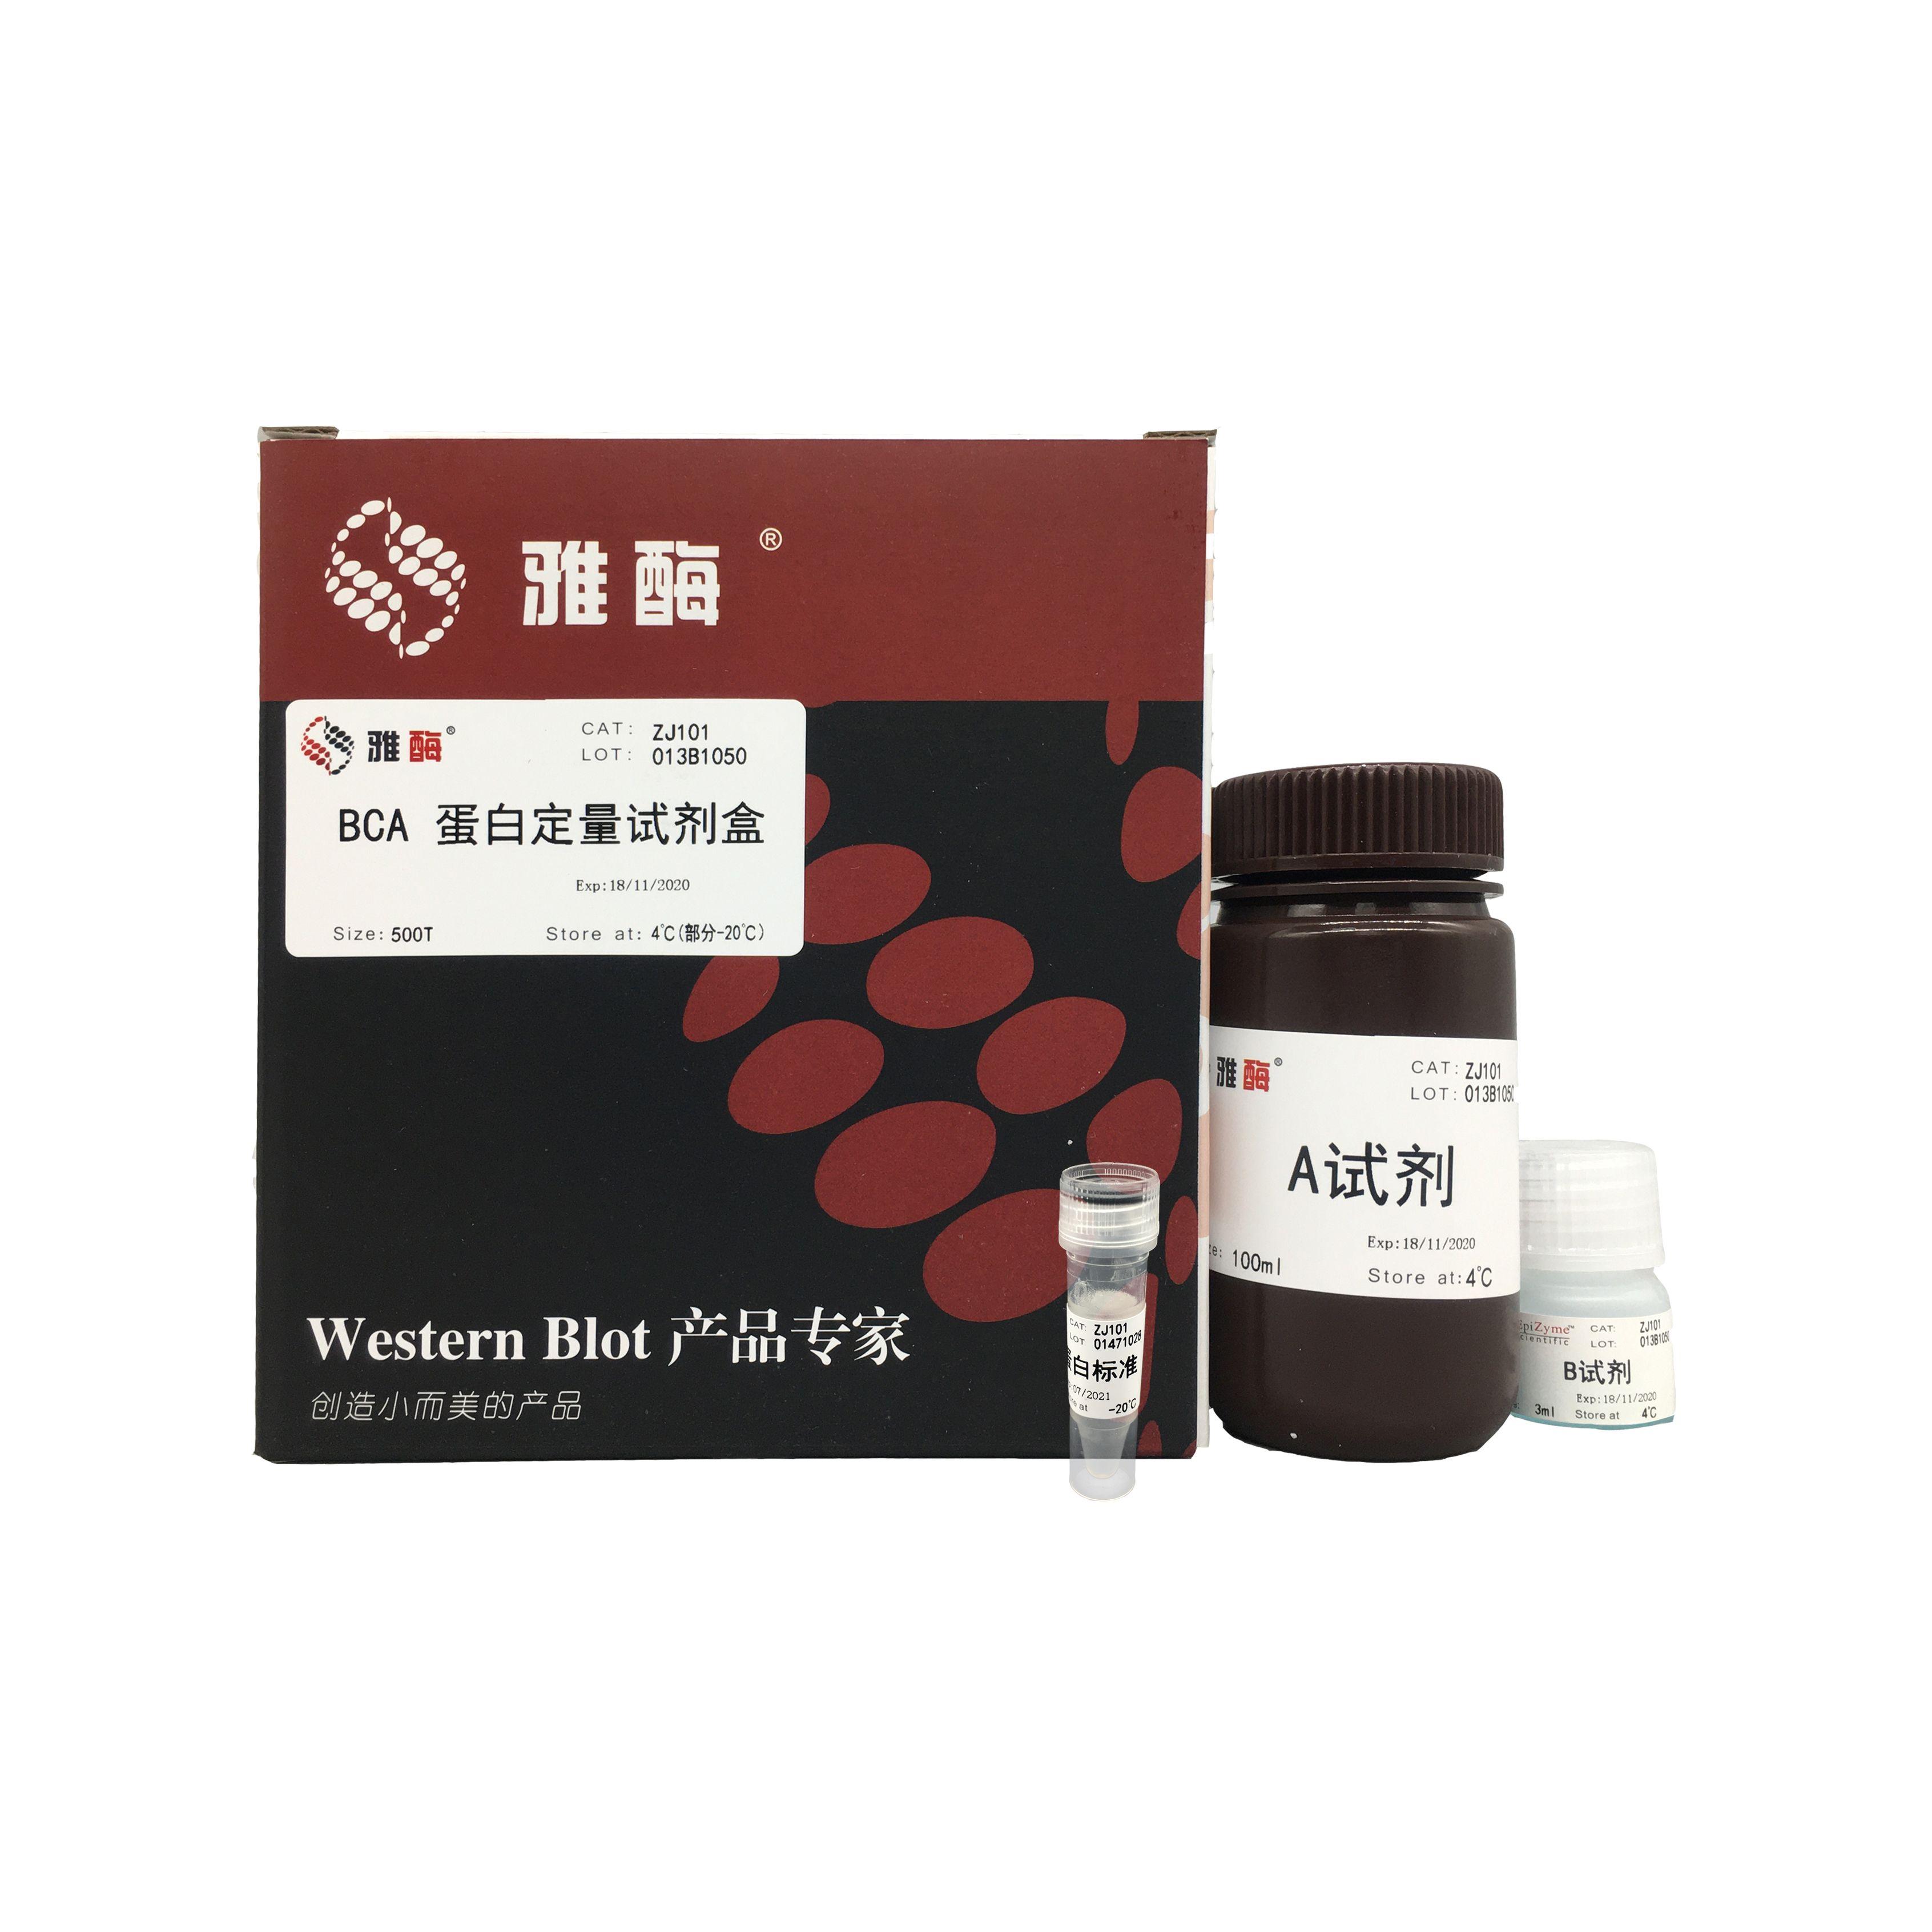 ZJ101 BCA蛋白定量试剂盒